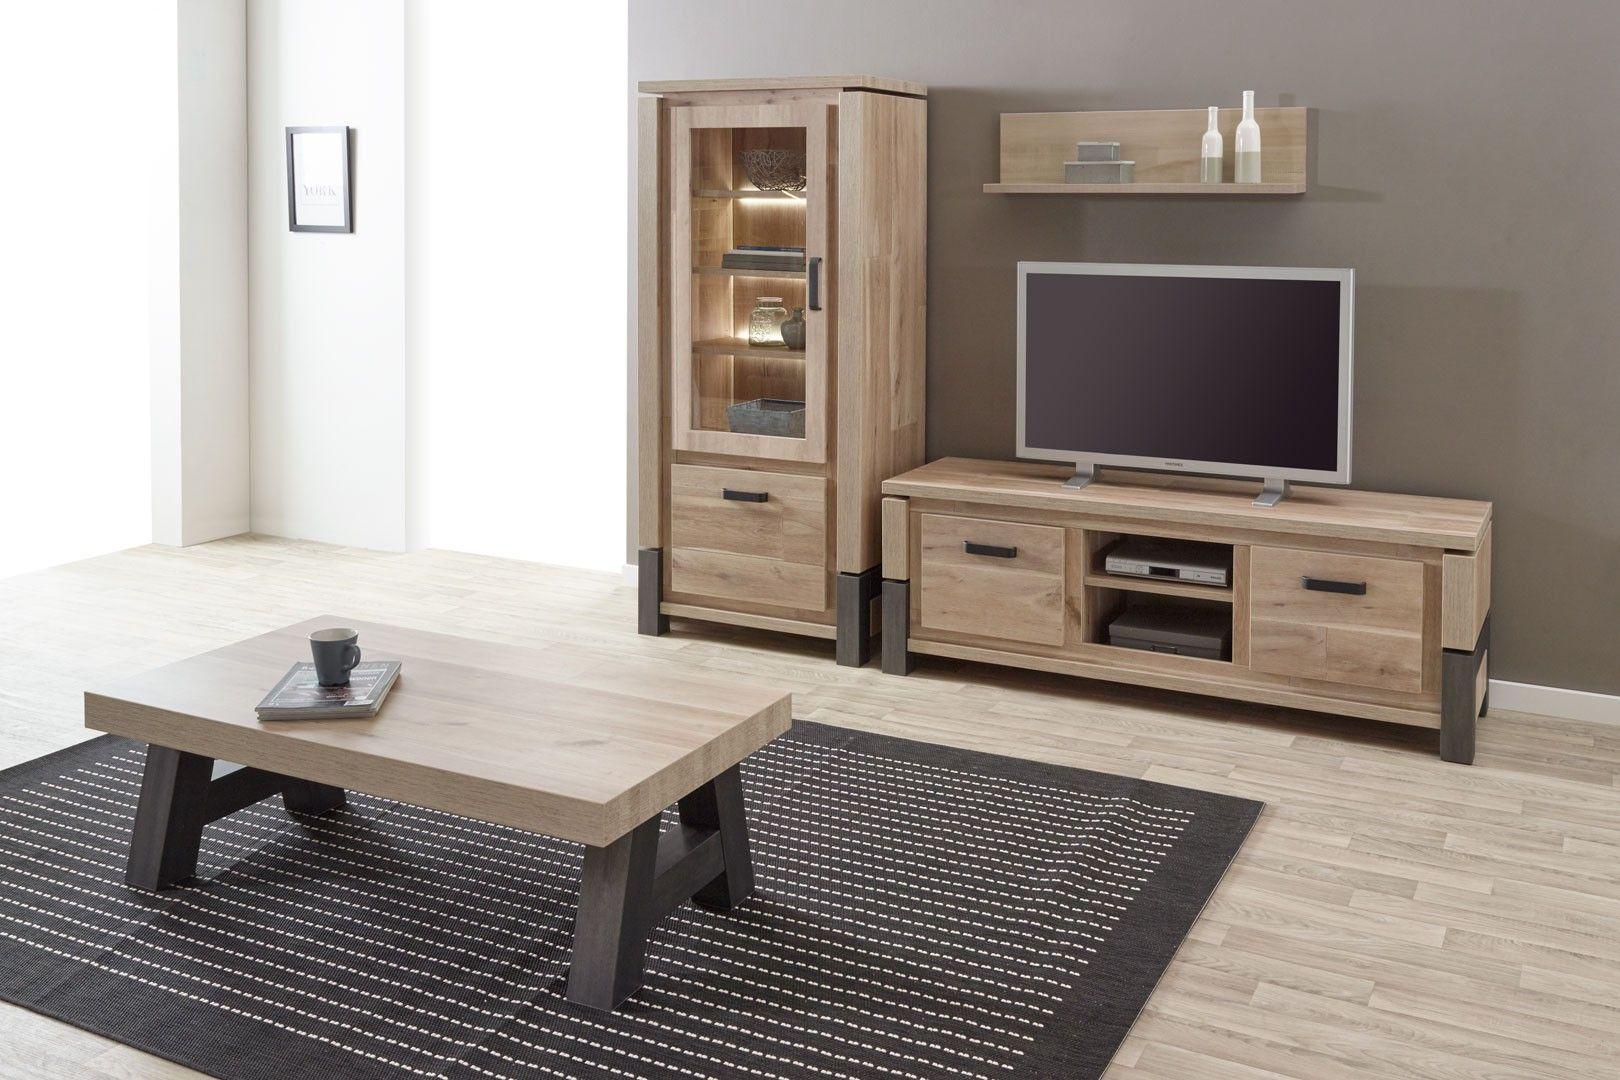 meuble tv contemporain 166 cm coloris